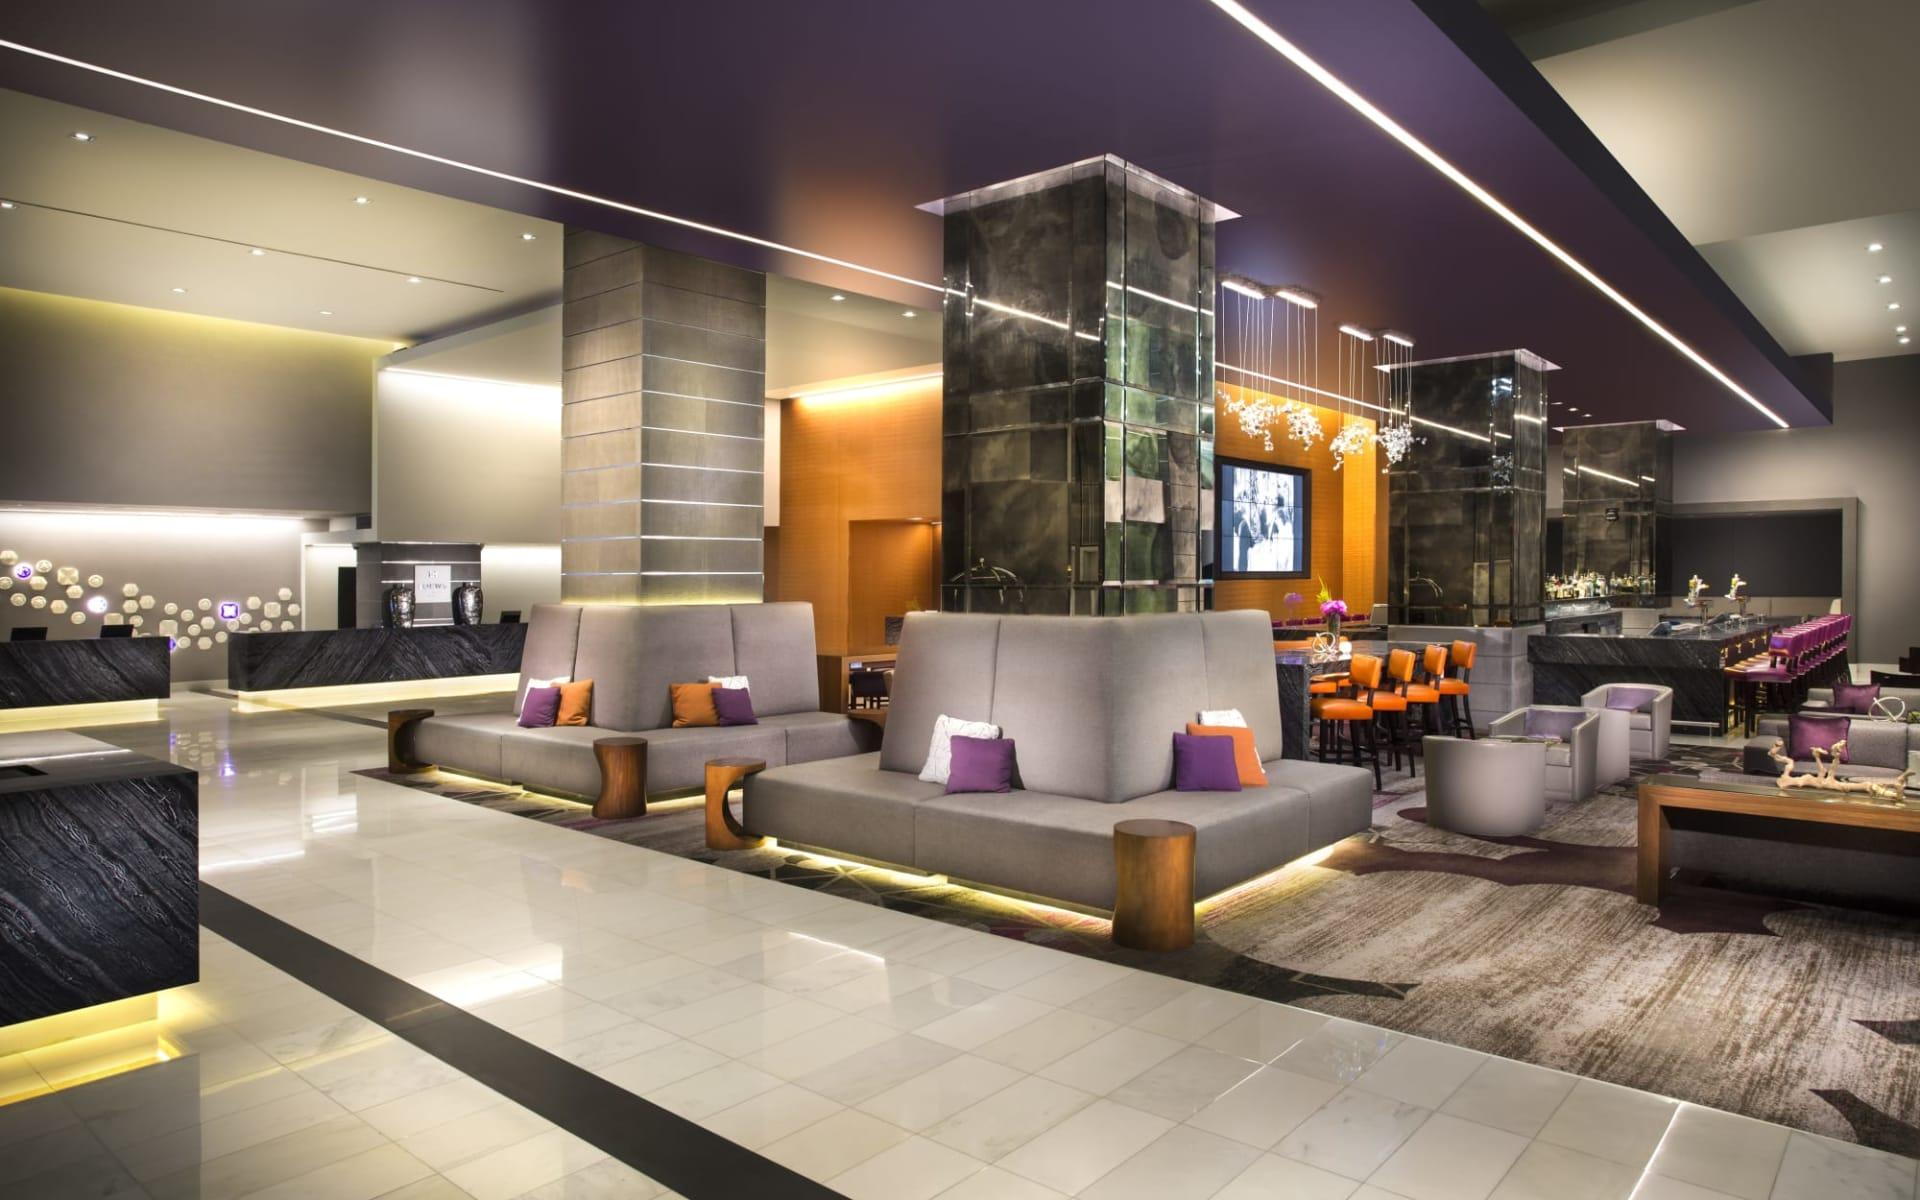 Loews Hollywood Hotel:  Loews Hollywood - Lobby